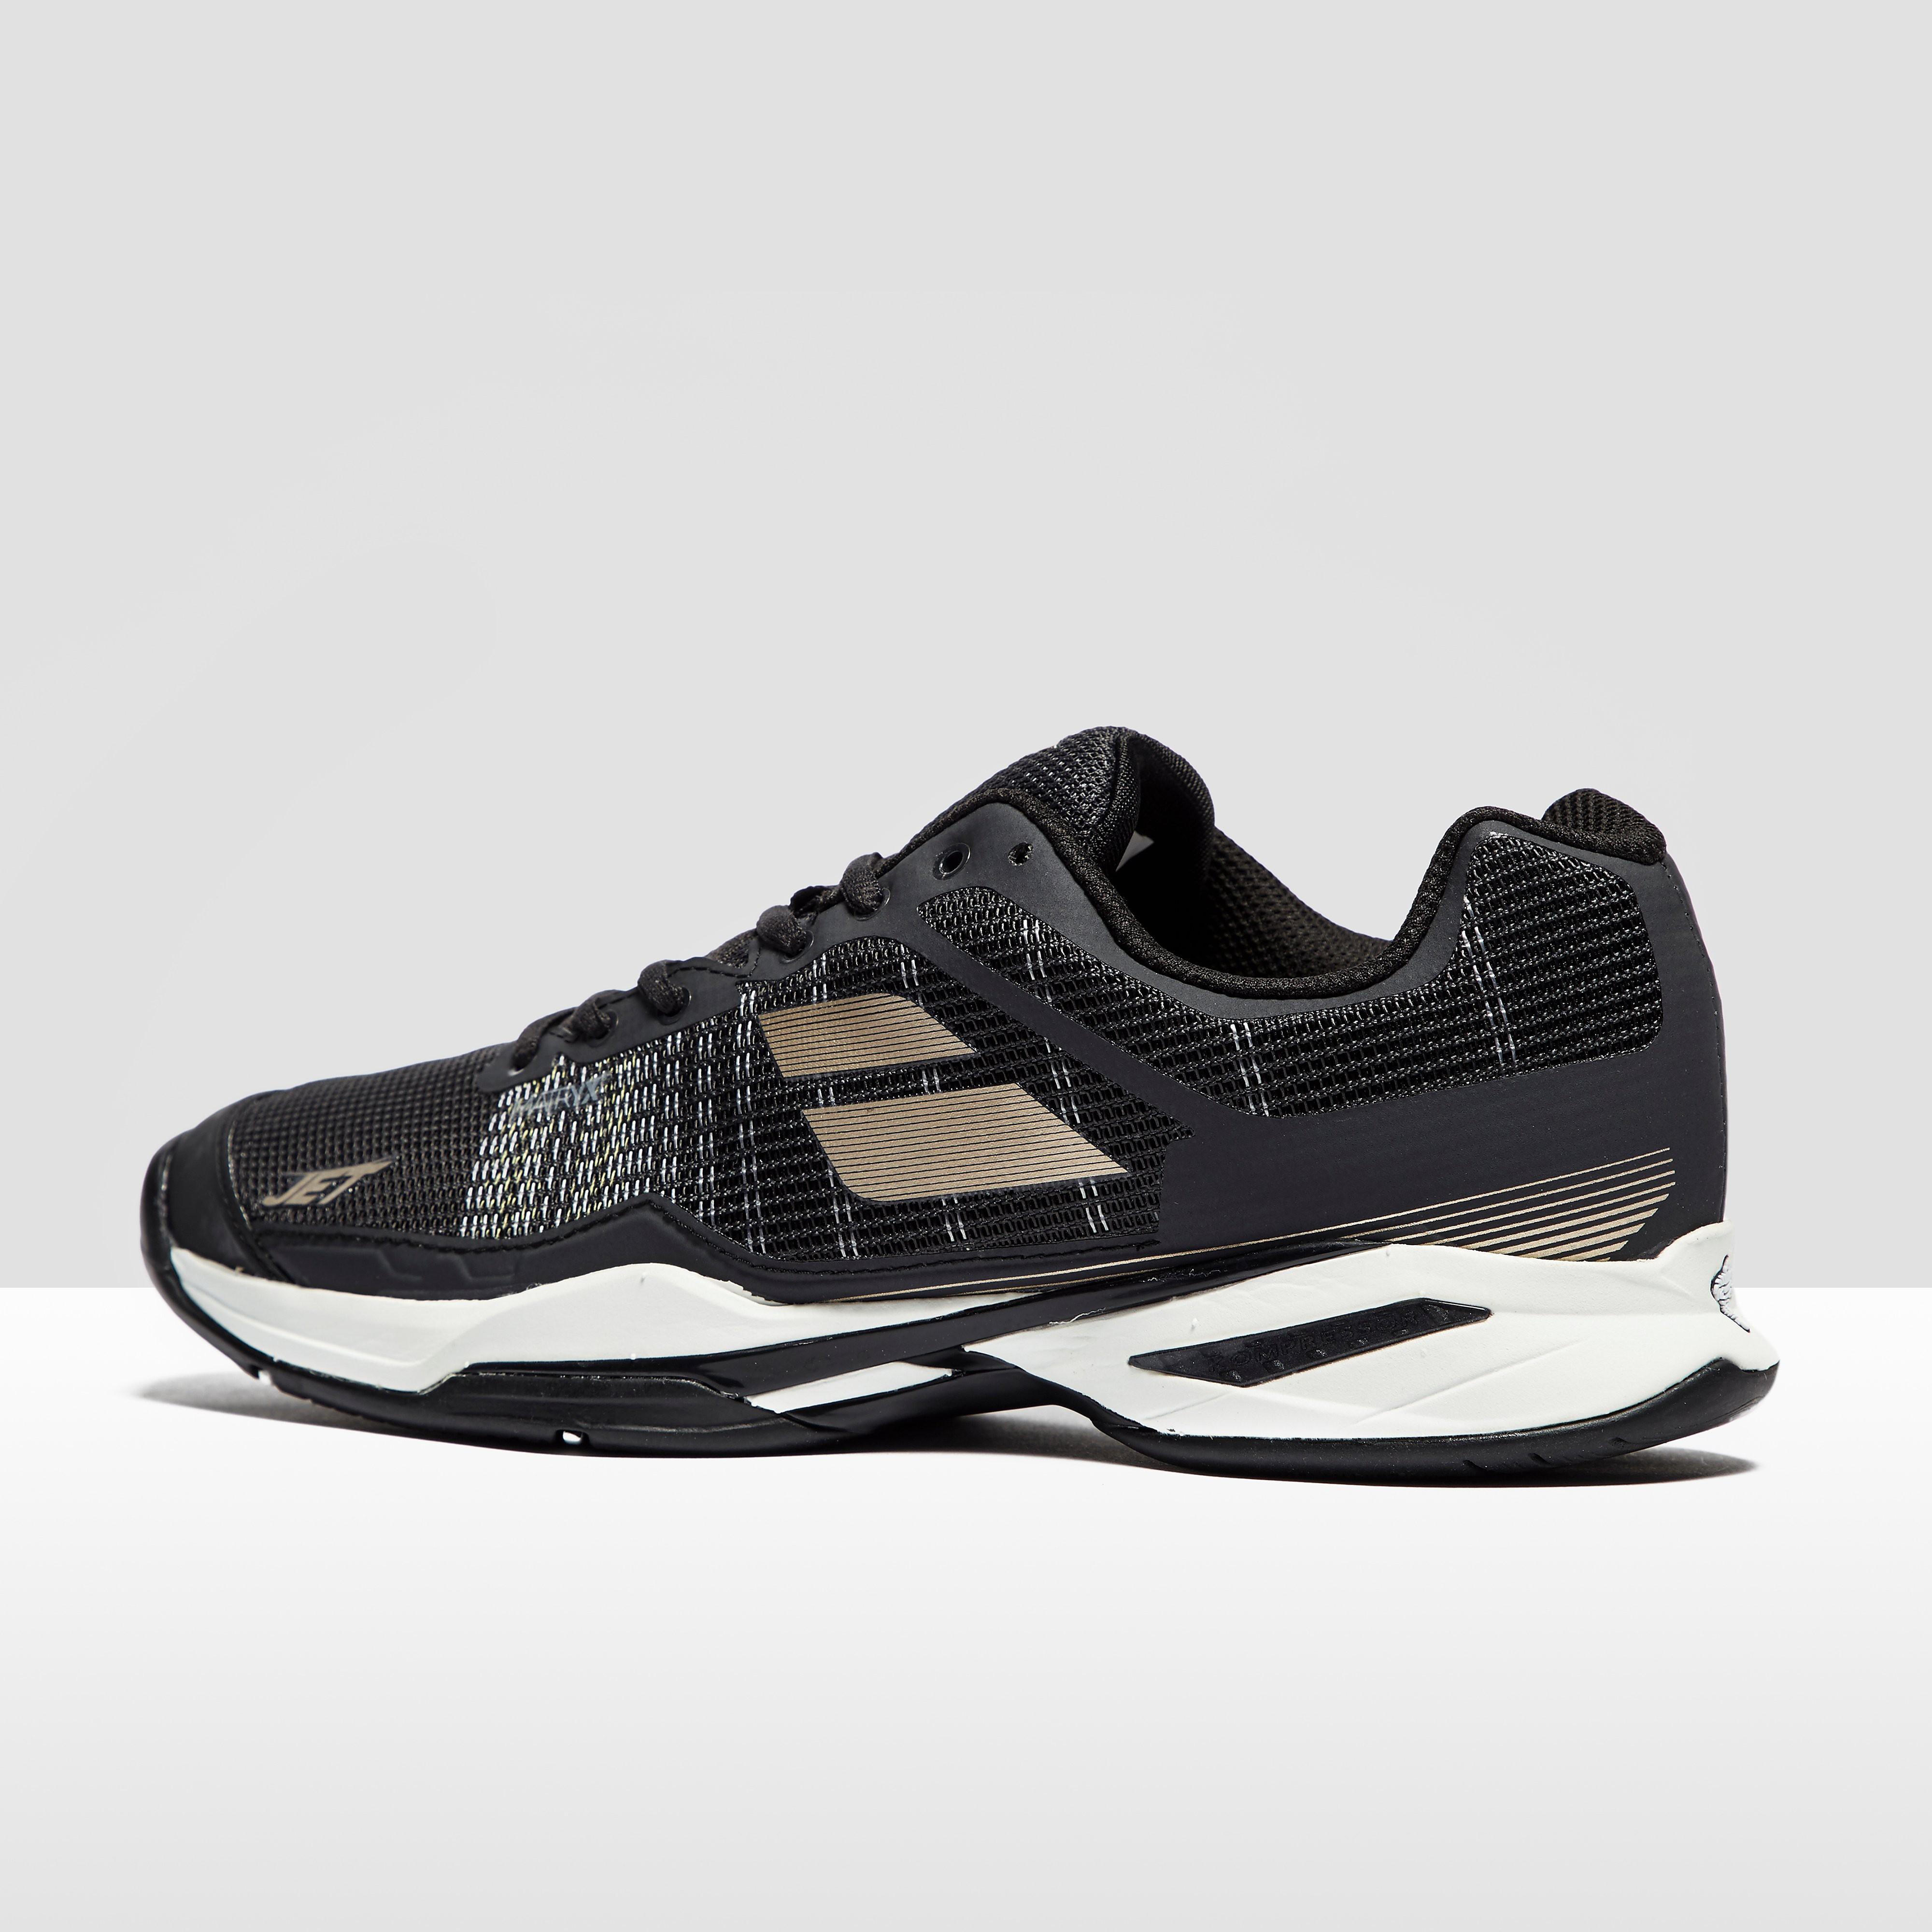 Babolat Jet Mach I All Court Men's Tennis Shoes